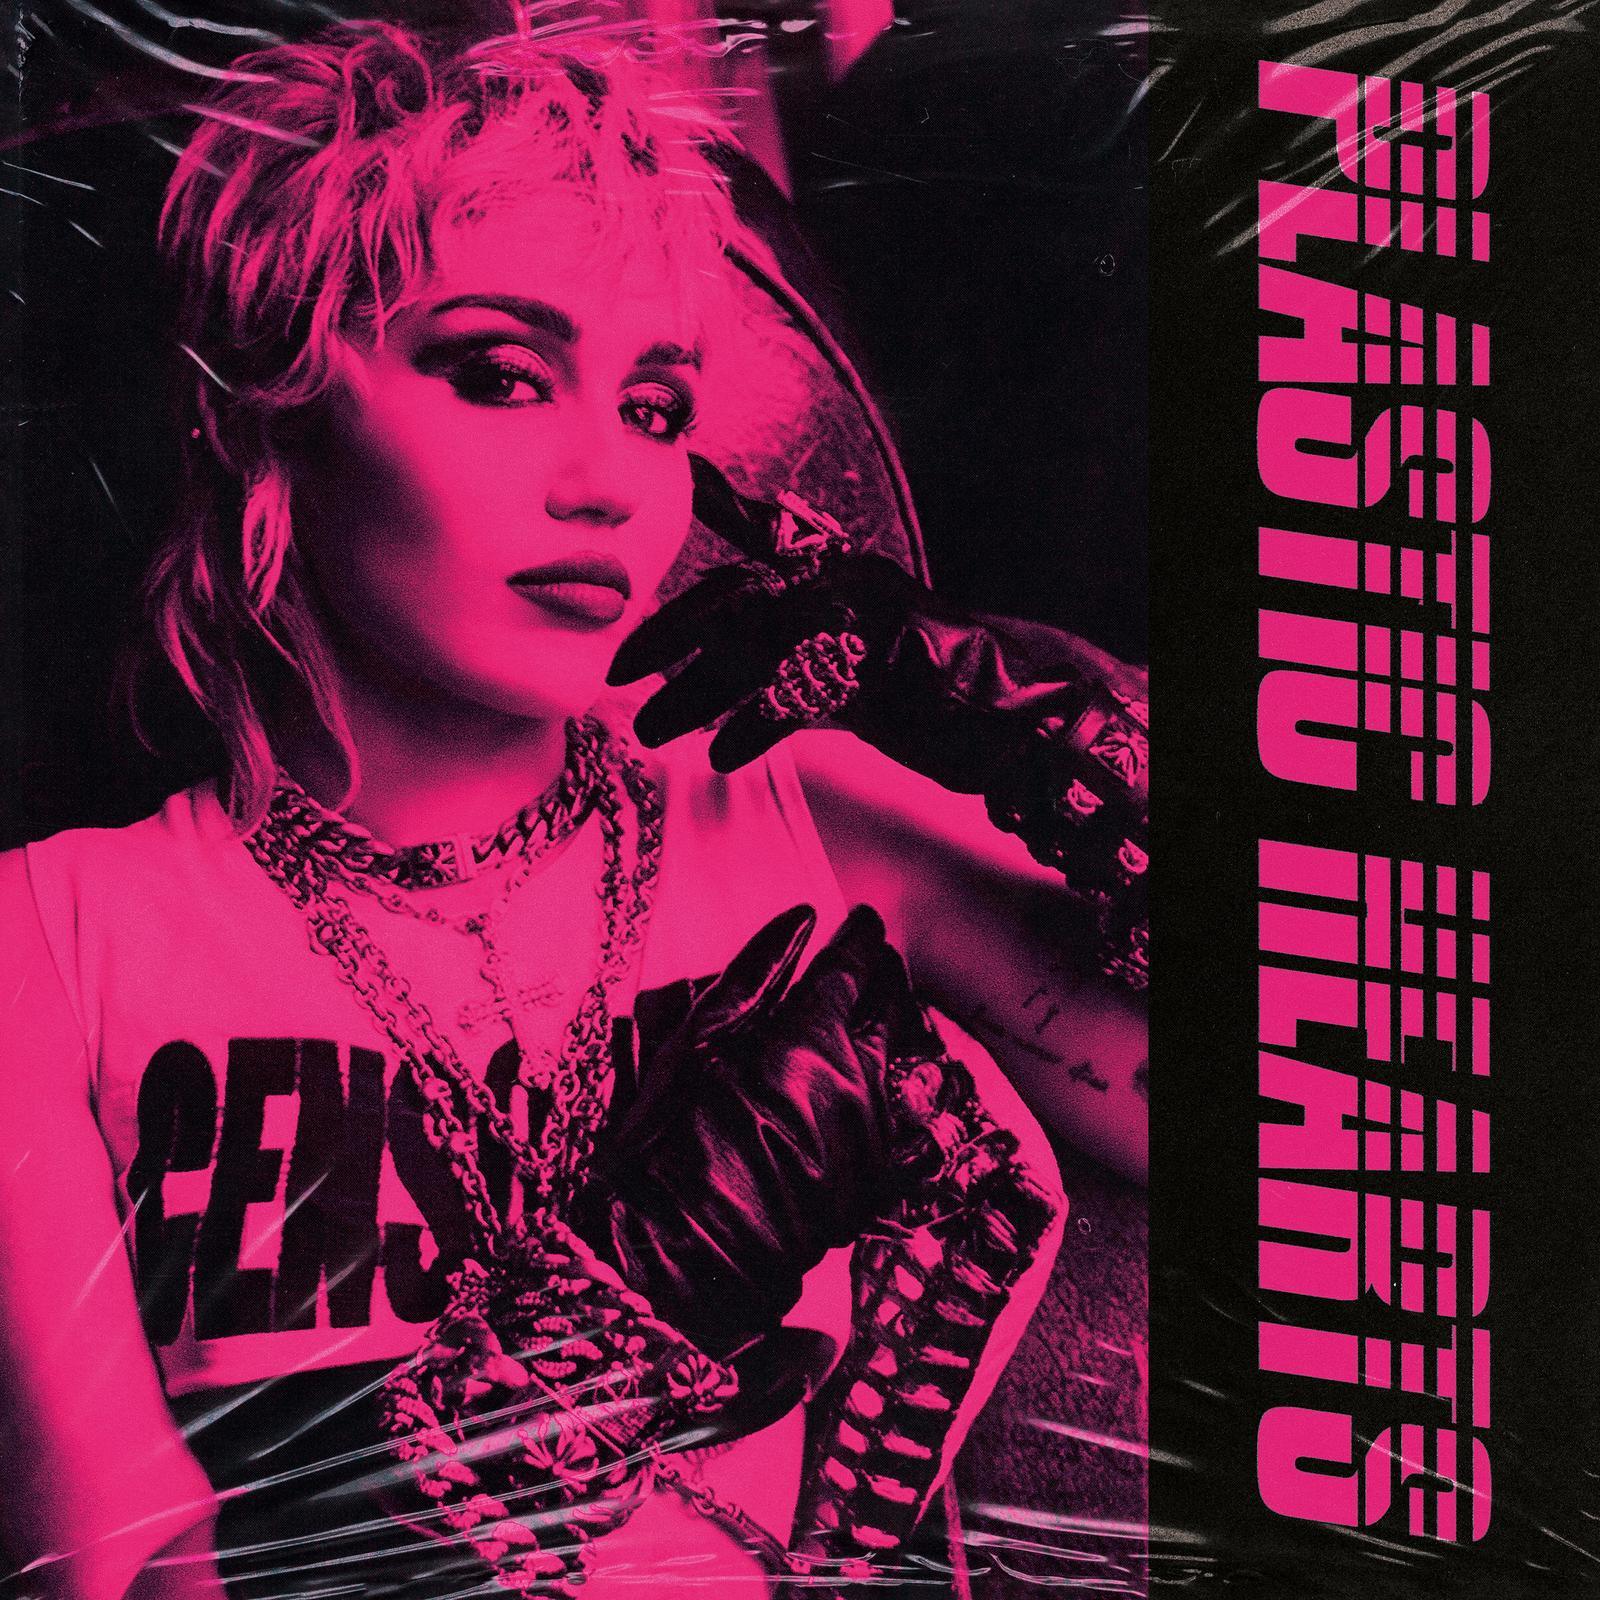 miley-cyrus-Miley_Cyrus_-_Plastic_Hearts_Artwork.jpeg